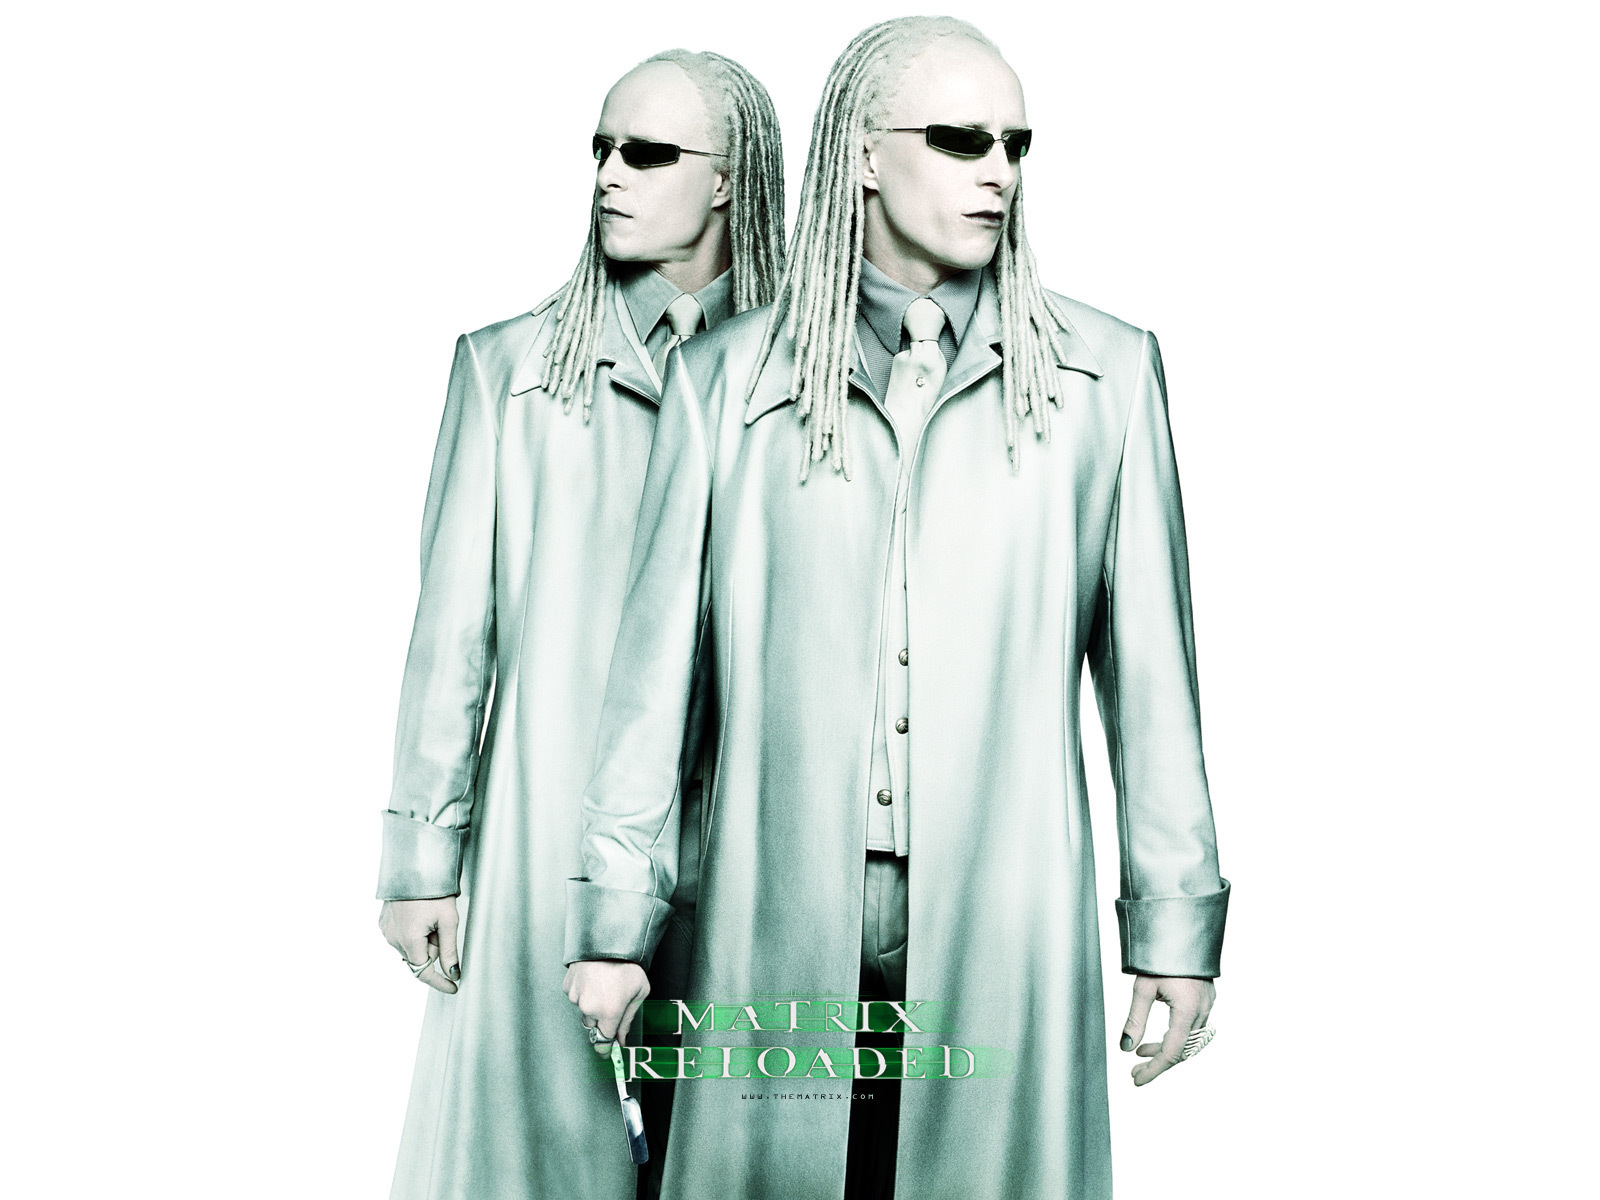 Matrix reloaded villains villains wallpaper 7482655 for Matrix reloaded architect